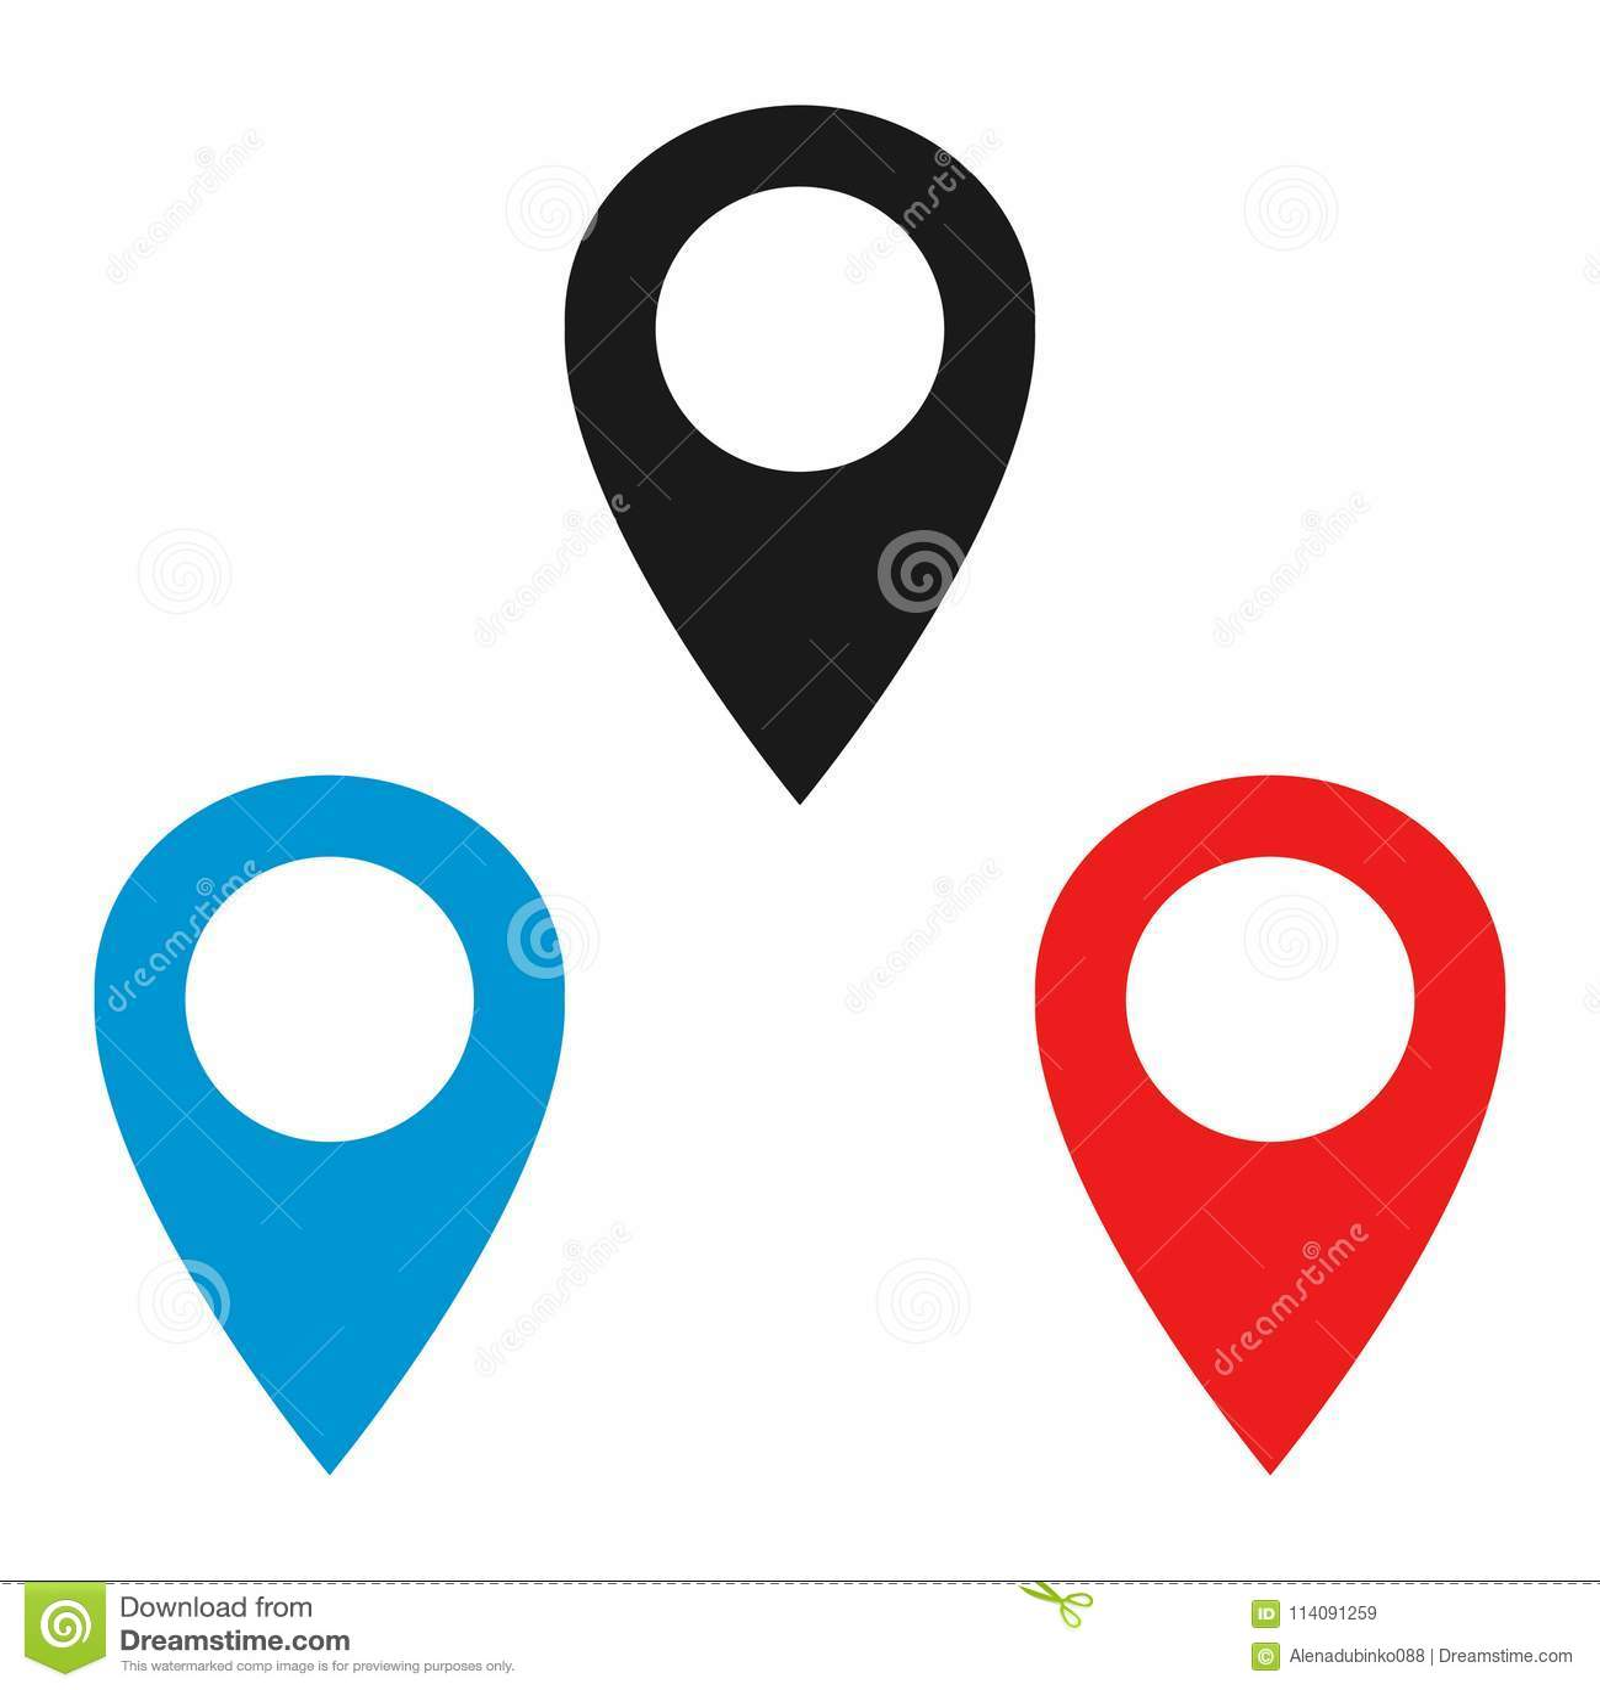 Navigation Pin Or Map Pin. GPS Location Symbol Stock Vector ... on mod symbols, power symbols, crane symbols, sport symbols, baltimore symbols, cd symbols, race symbols, state symbols, real symbols, cook symbols,